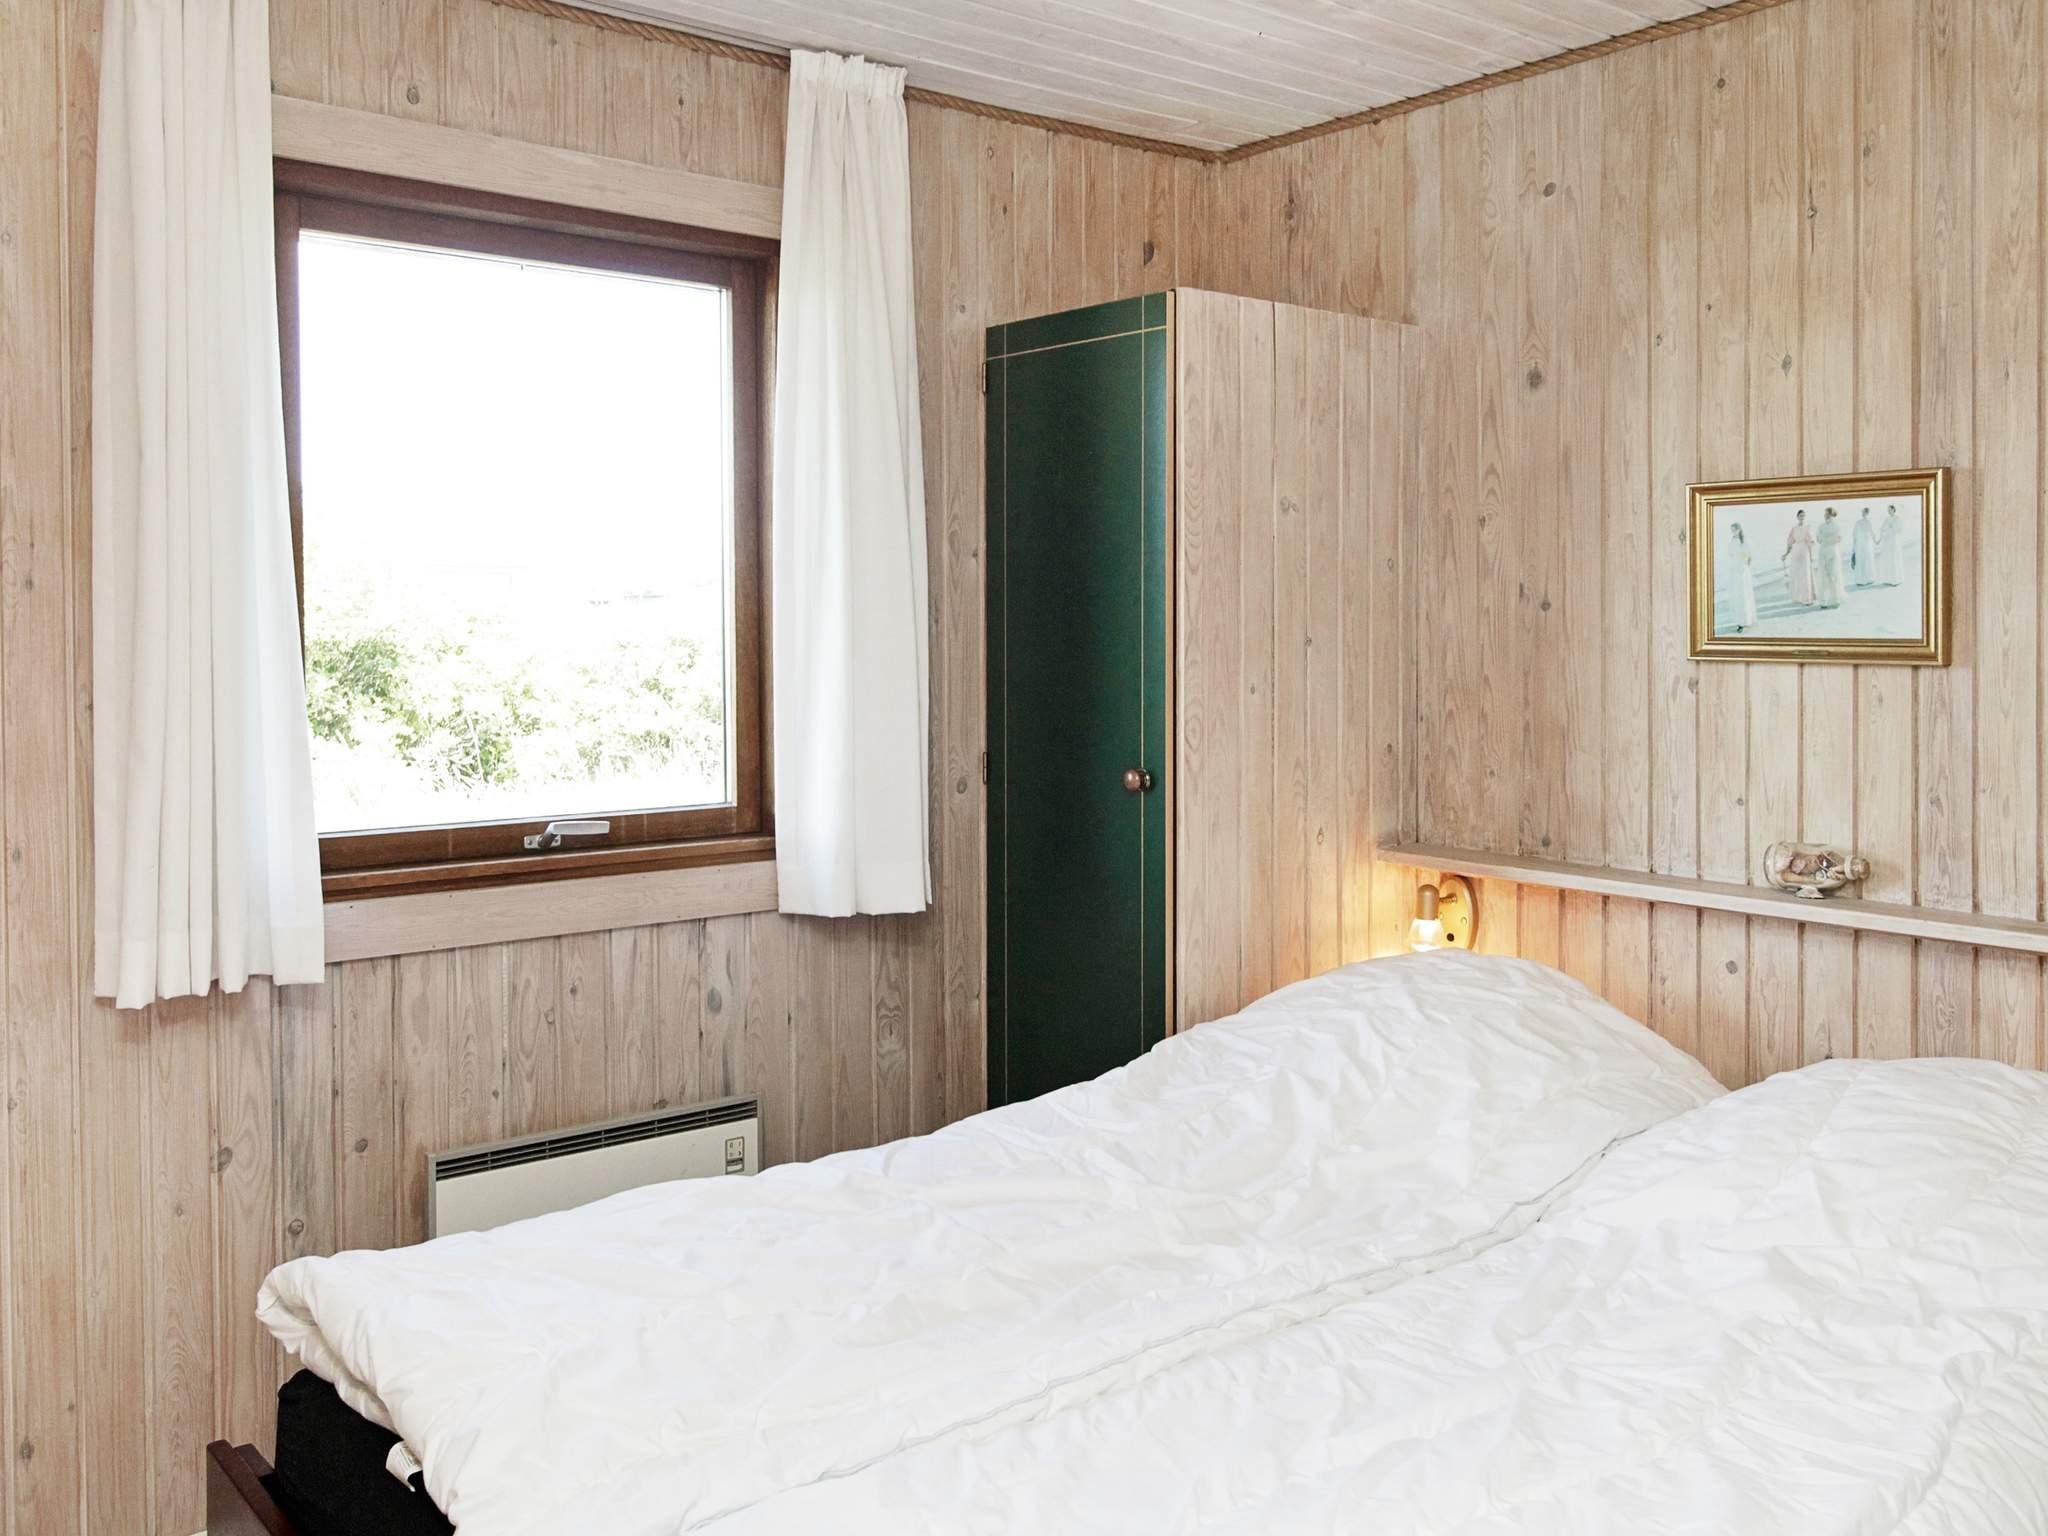 Ferienhaus Grønhøj Strand (83808), Løkken, , Nordwestjütland, Dänemark, Bild 11